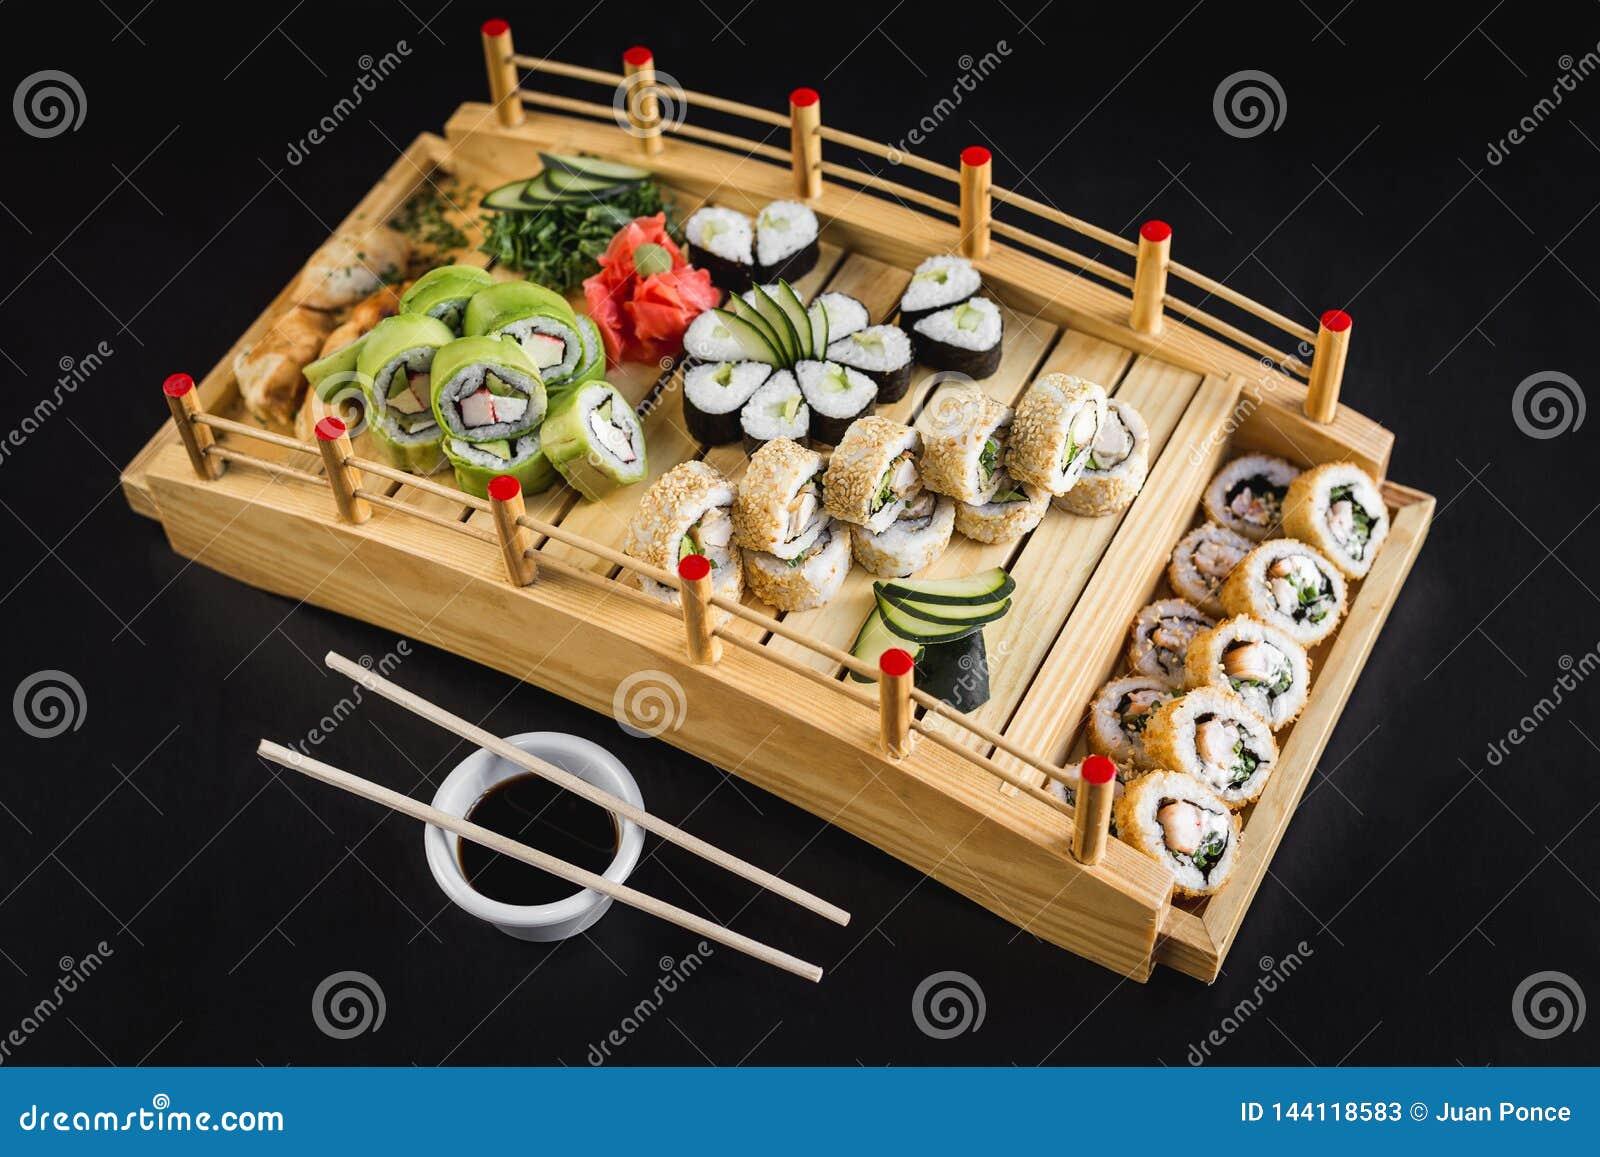 Sushi table with california, avocado, hosomaki and tempura rolls on a wooden table